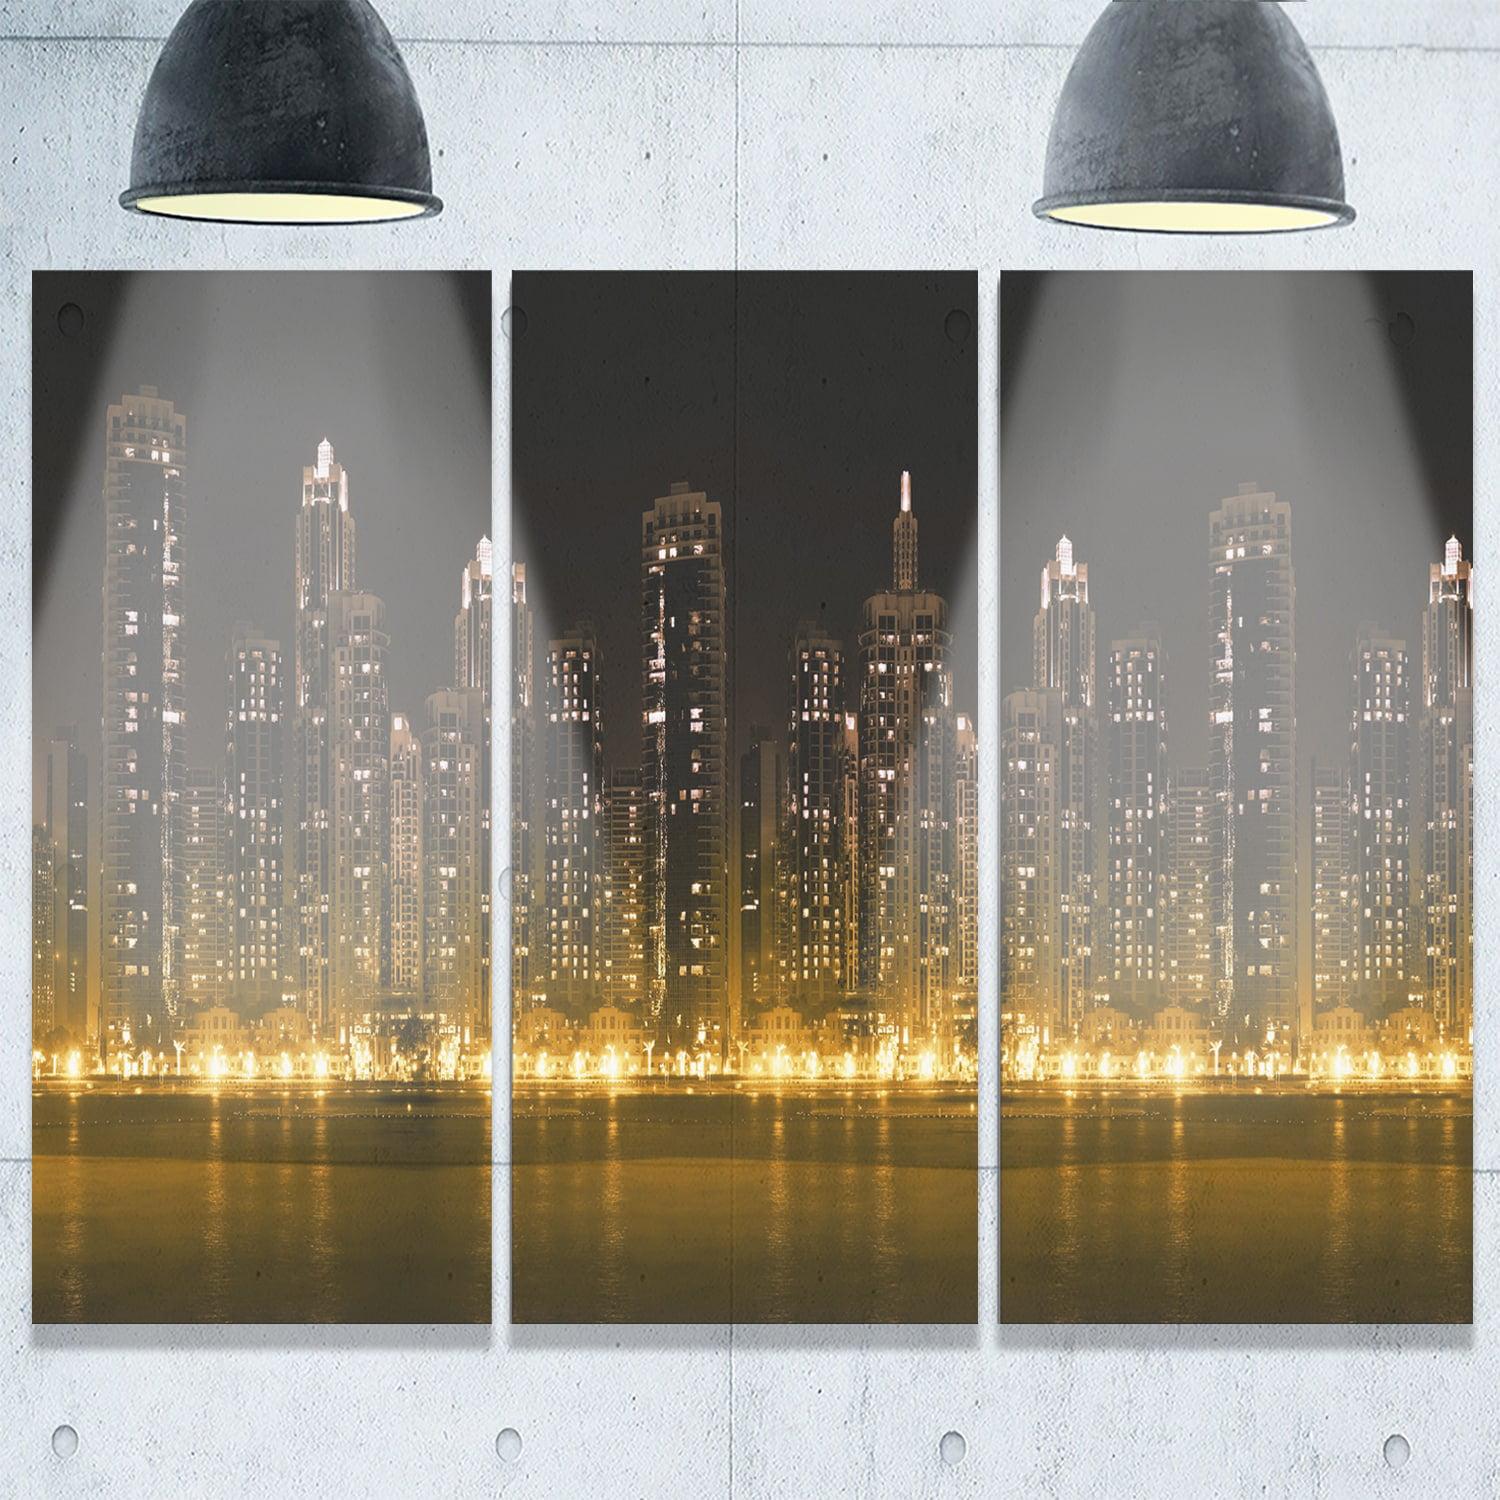 DESIGN ART Modern City with Illuminated Skyscrapers ...